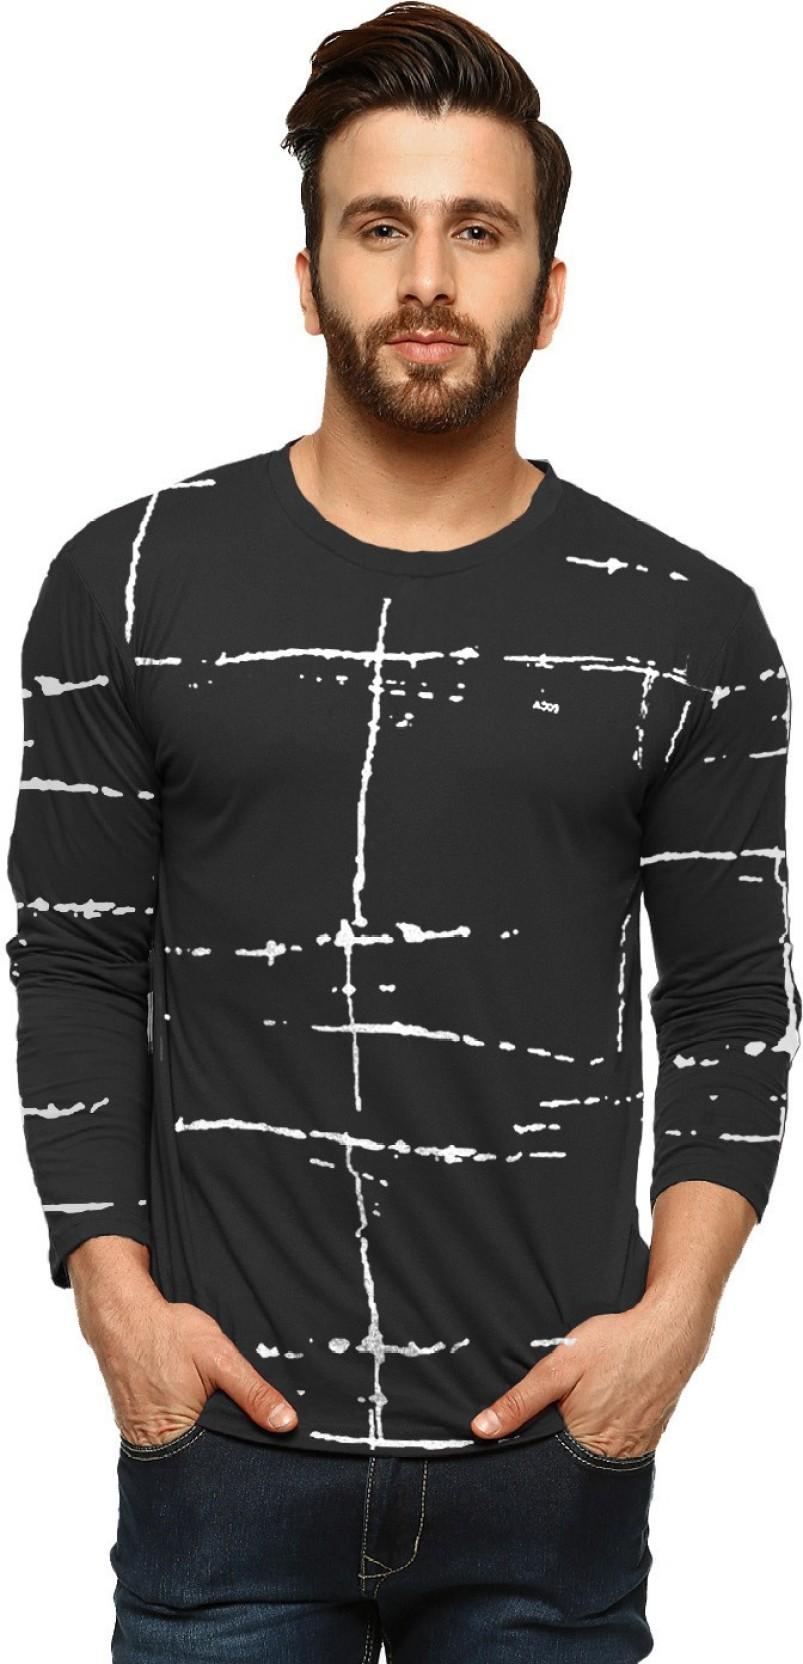 ba7ca1fed5 Tripr Printed Men's Round Neck Black T-Shirt - Buy Tripr Printed ...